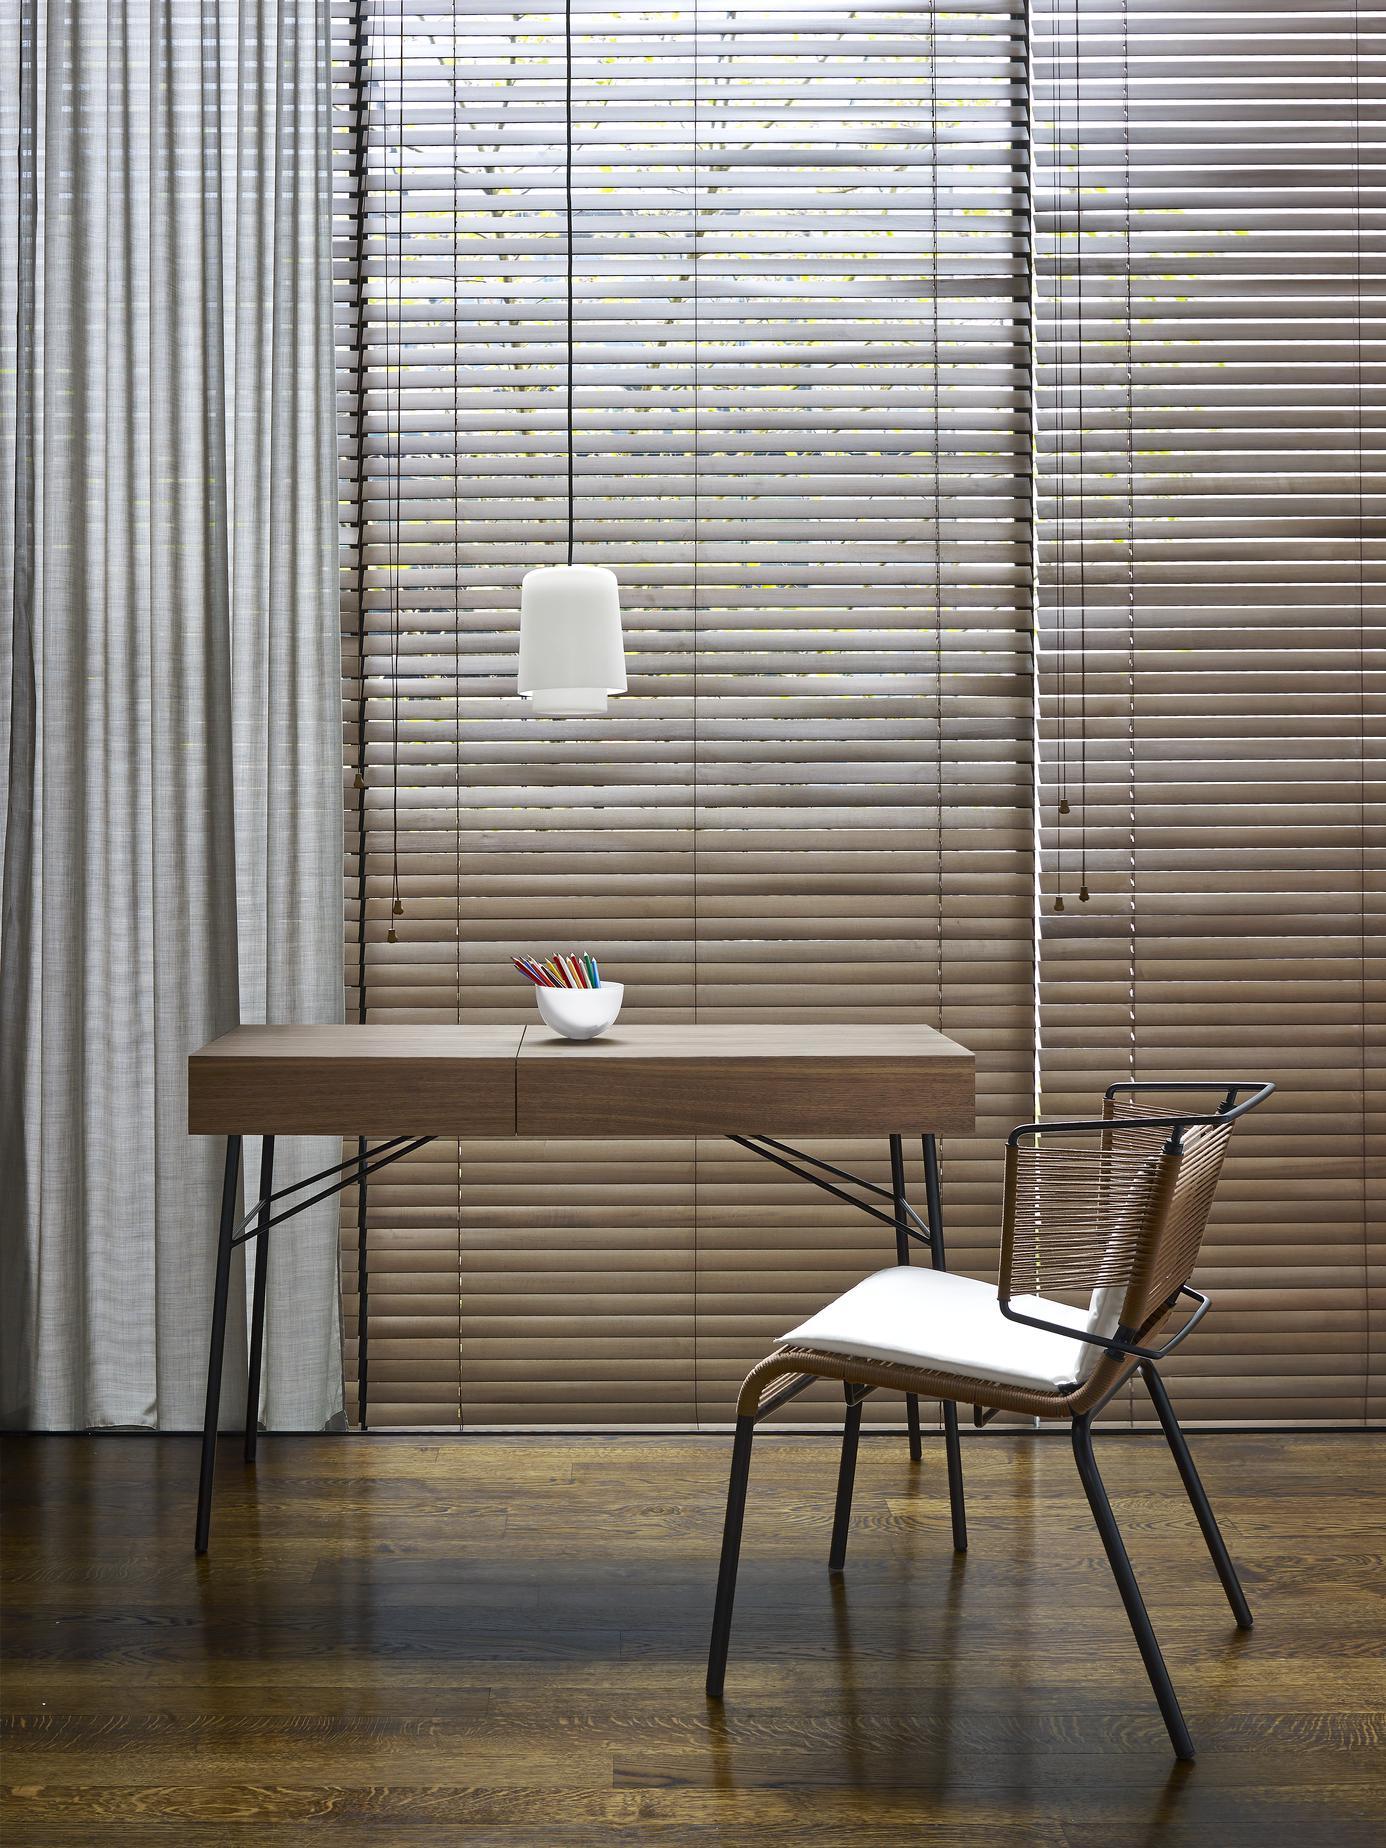 juliette bureaux et secr taires designer evangelos vasileiou ligne roset. Black Bedroom Furniture Sets. Home Design Ideas